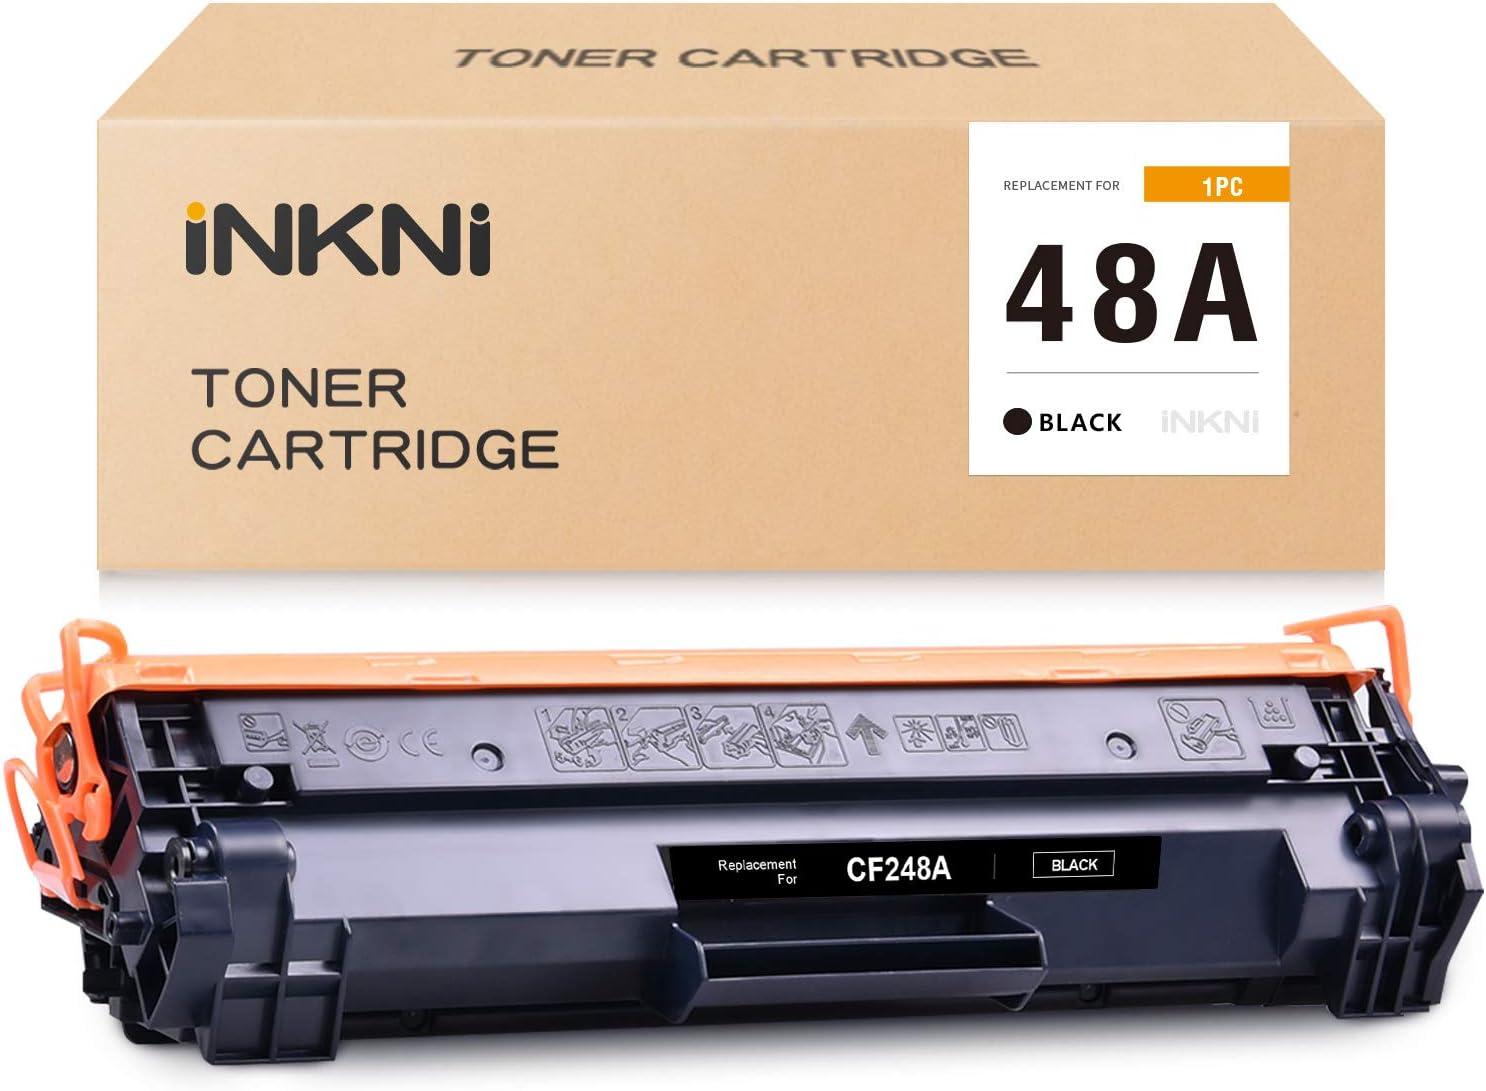 INKNI Compatible Toner Cartridge Replacement for HP 48A CF248A for Laserjet Pro M15w M15a M16a M16w MFP M28a M29a M28w M29w M31w M30w (1 Black)